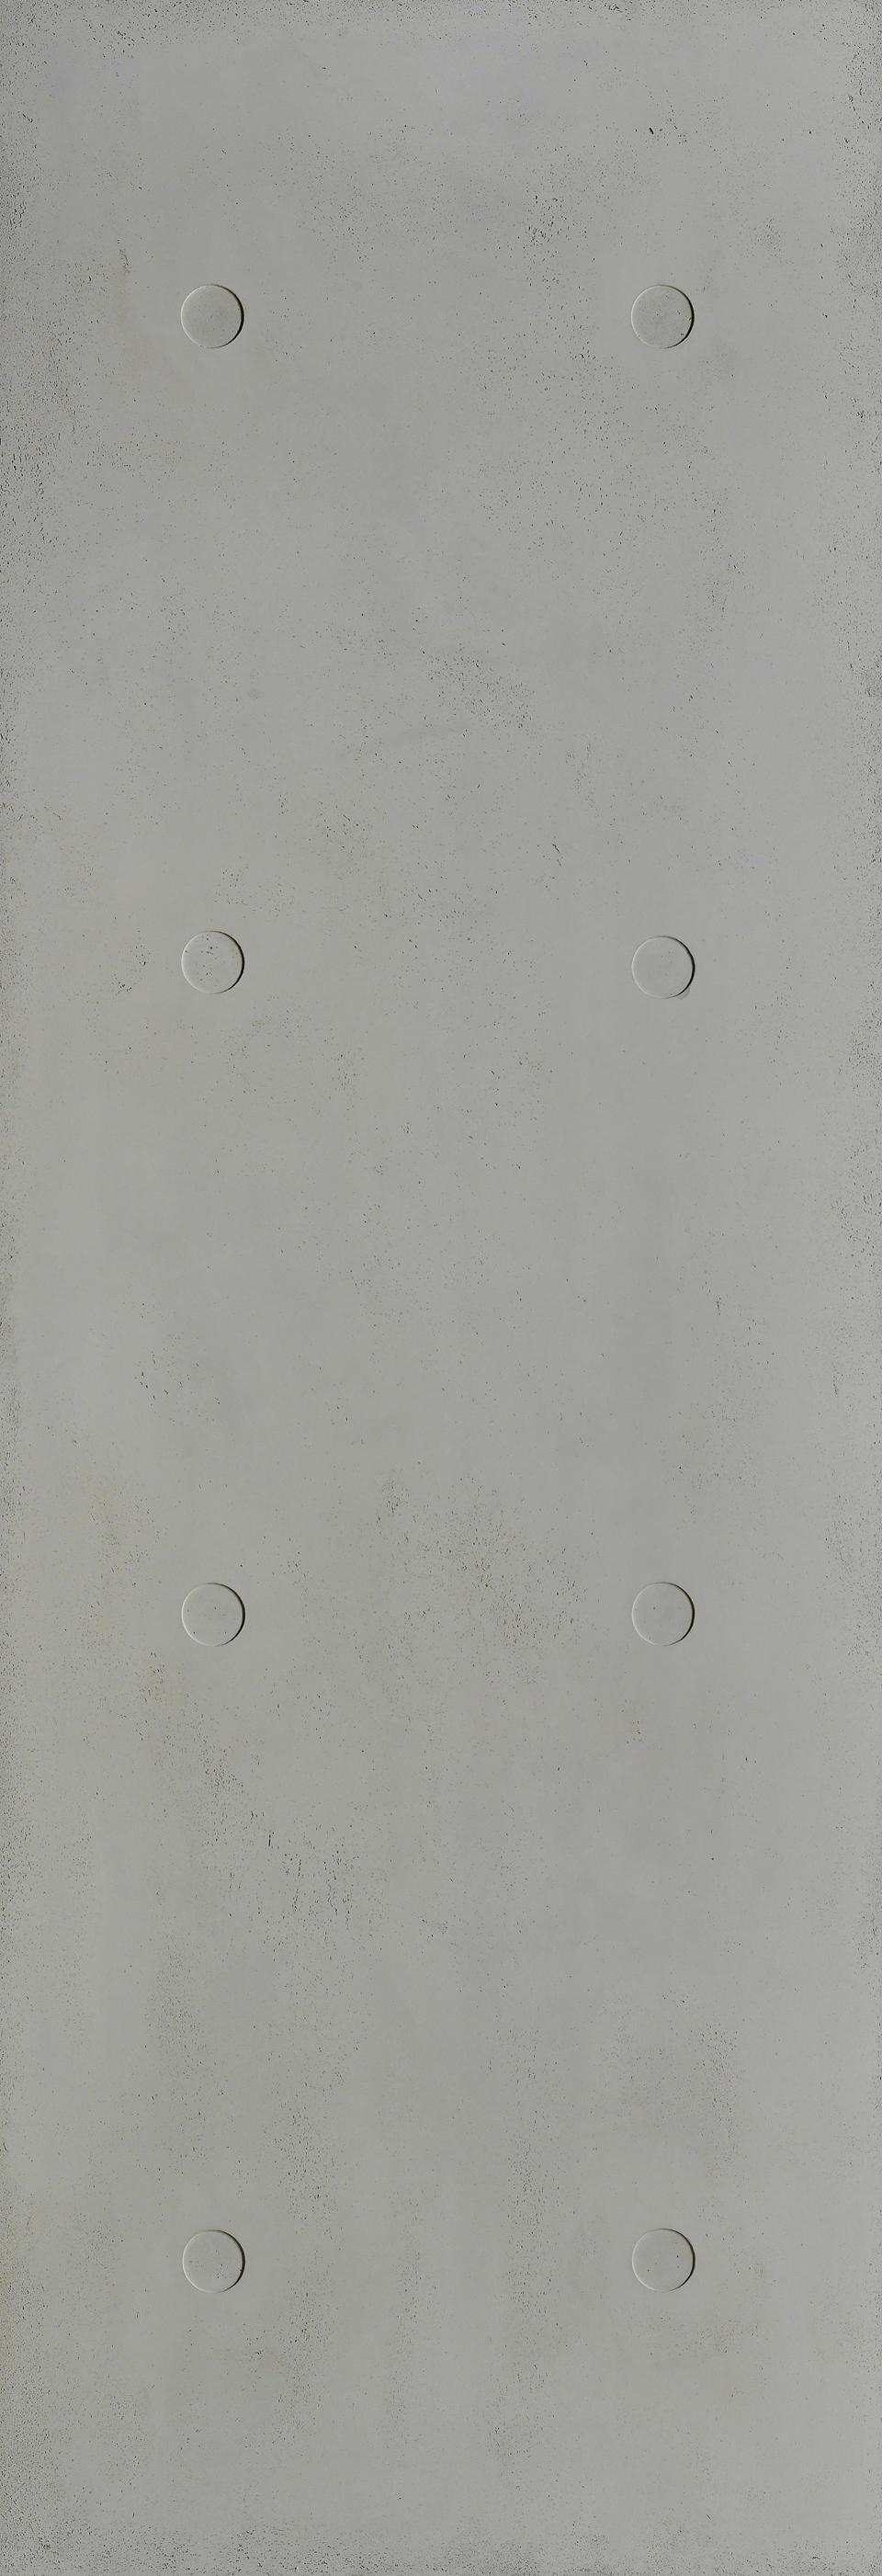 PANBETON SCAFFOLDED 2MM Concrete Panels From Concrete LCDA Architonic